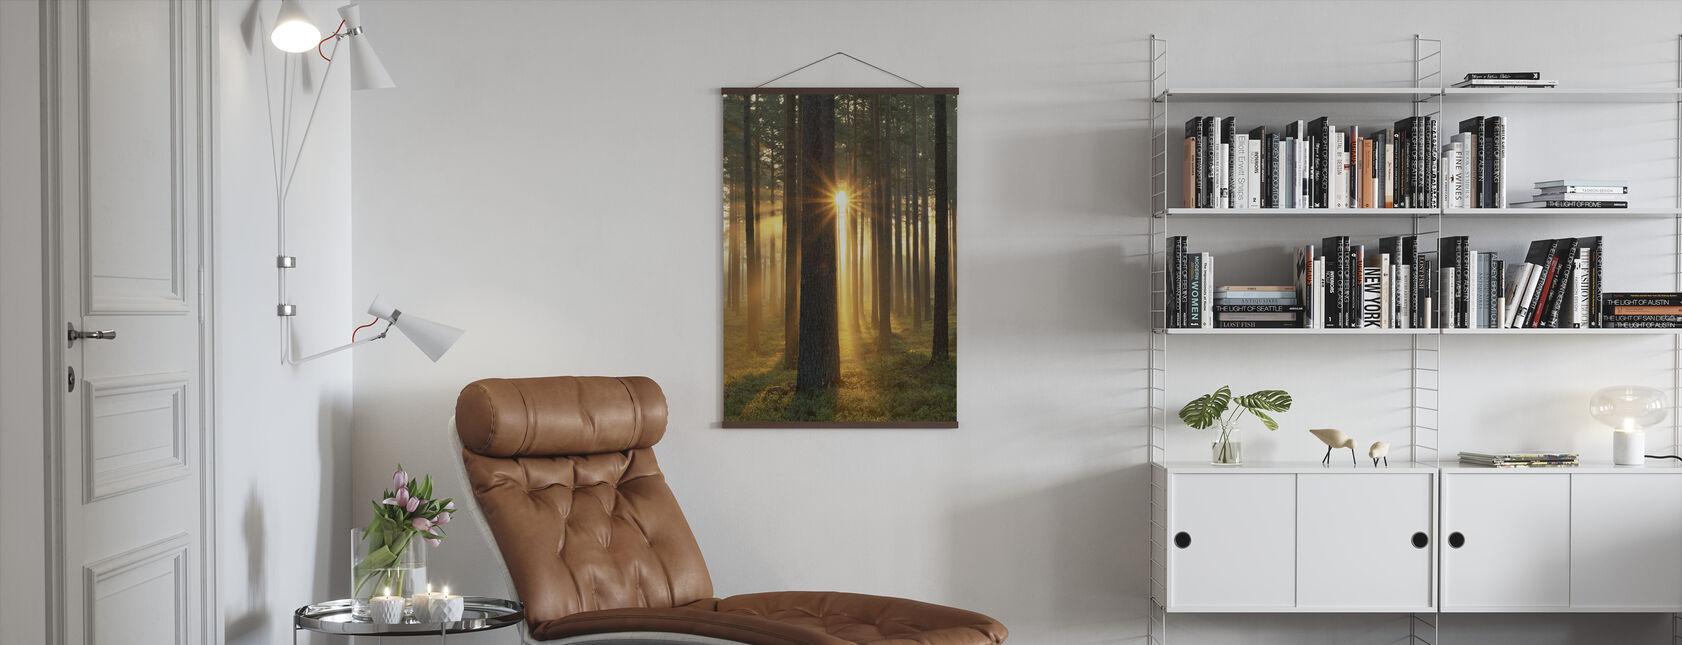 Höst Sunbeam - Poster - Vardagsrum